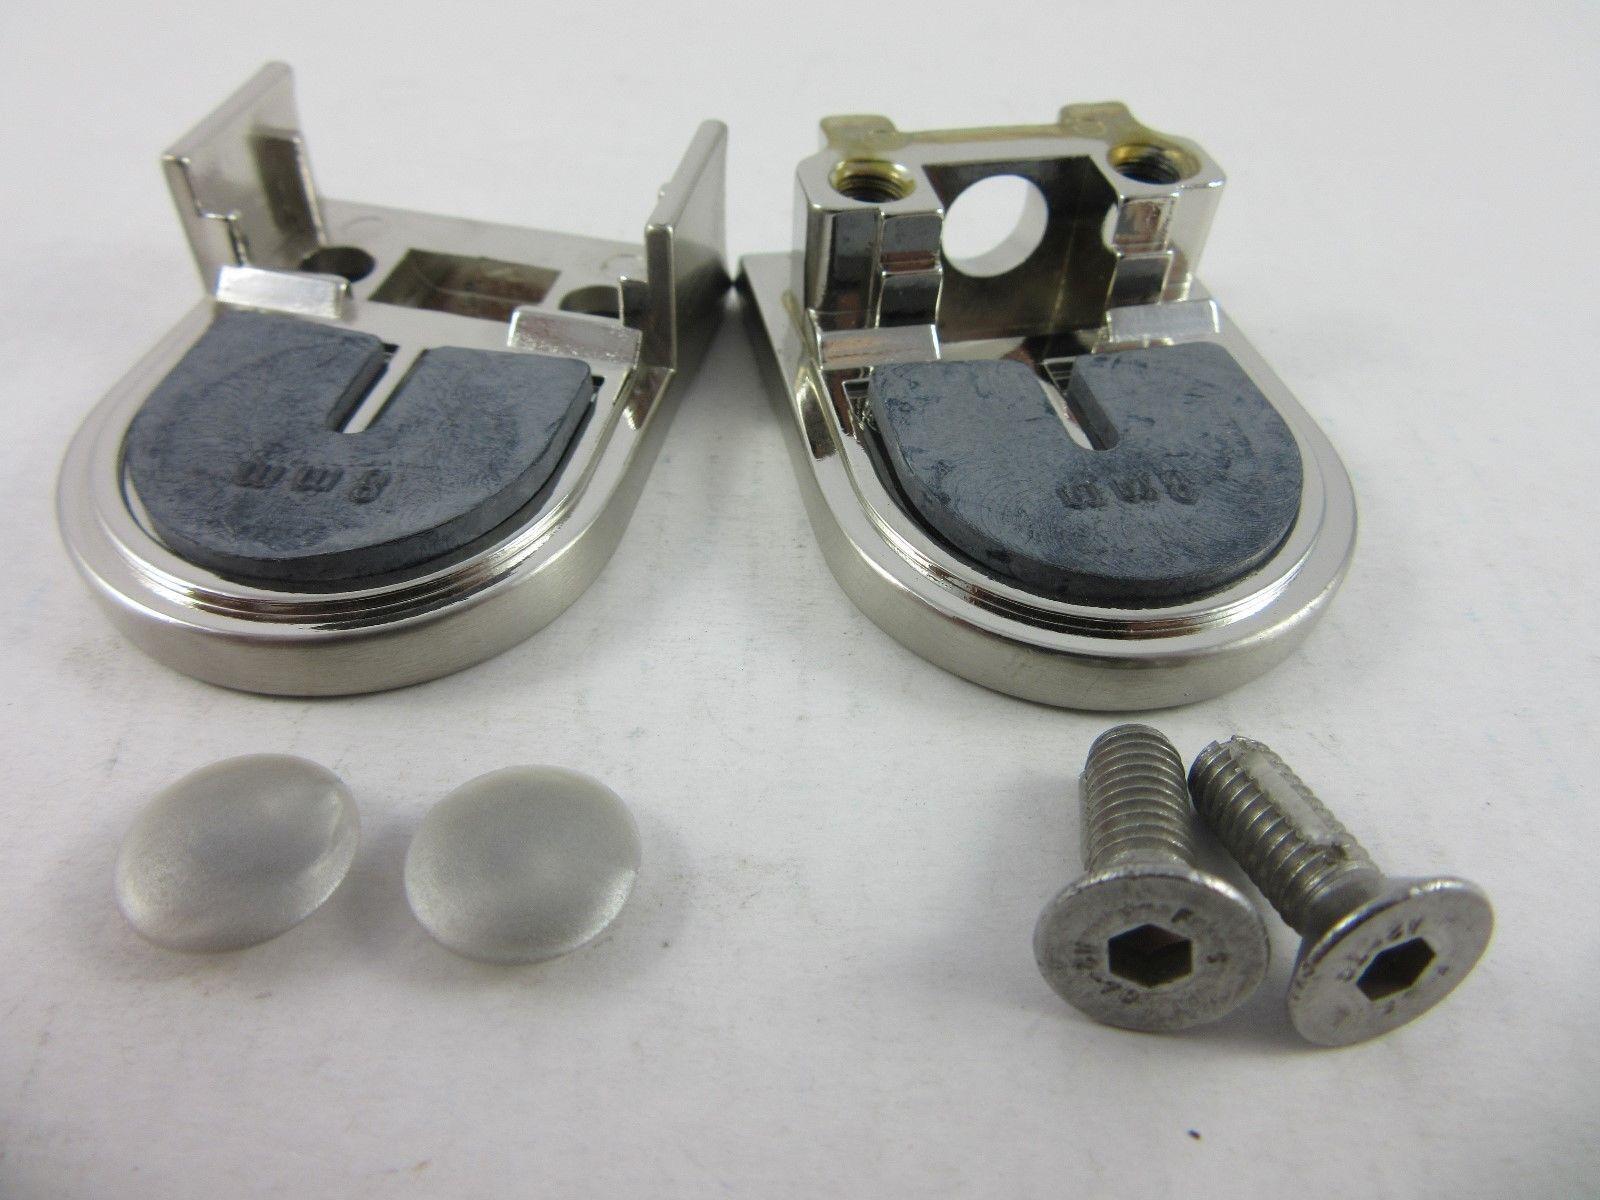 Glasklemme Glashalter Klemmbefestigung 8mm Zink Edelstahleffekt mattverchromt 53